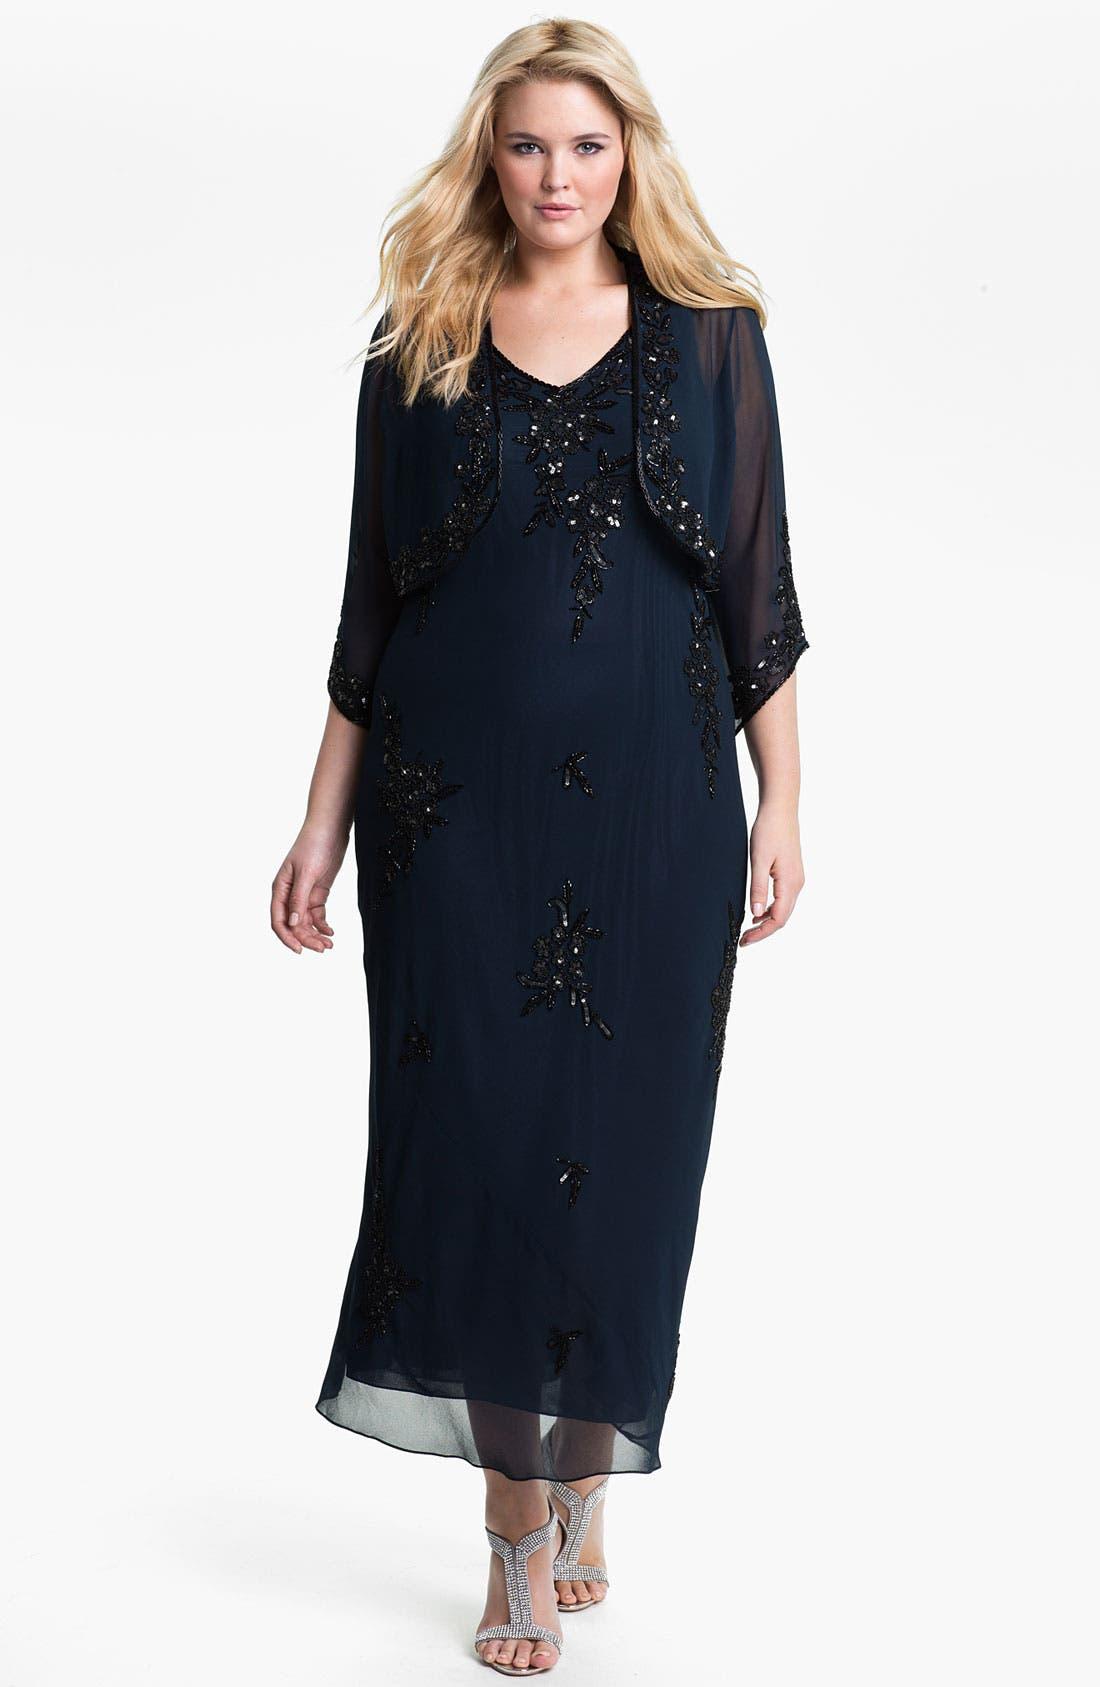 Main Image - J Kara Beaded Chiffon Dress & Jacket